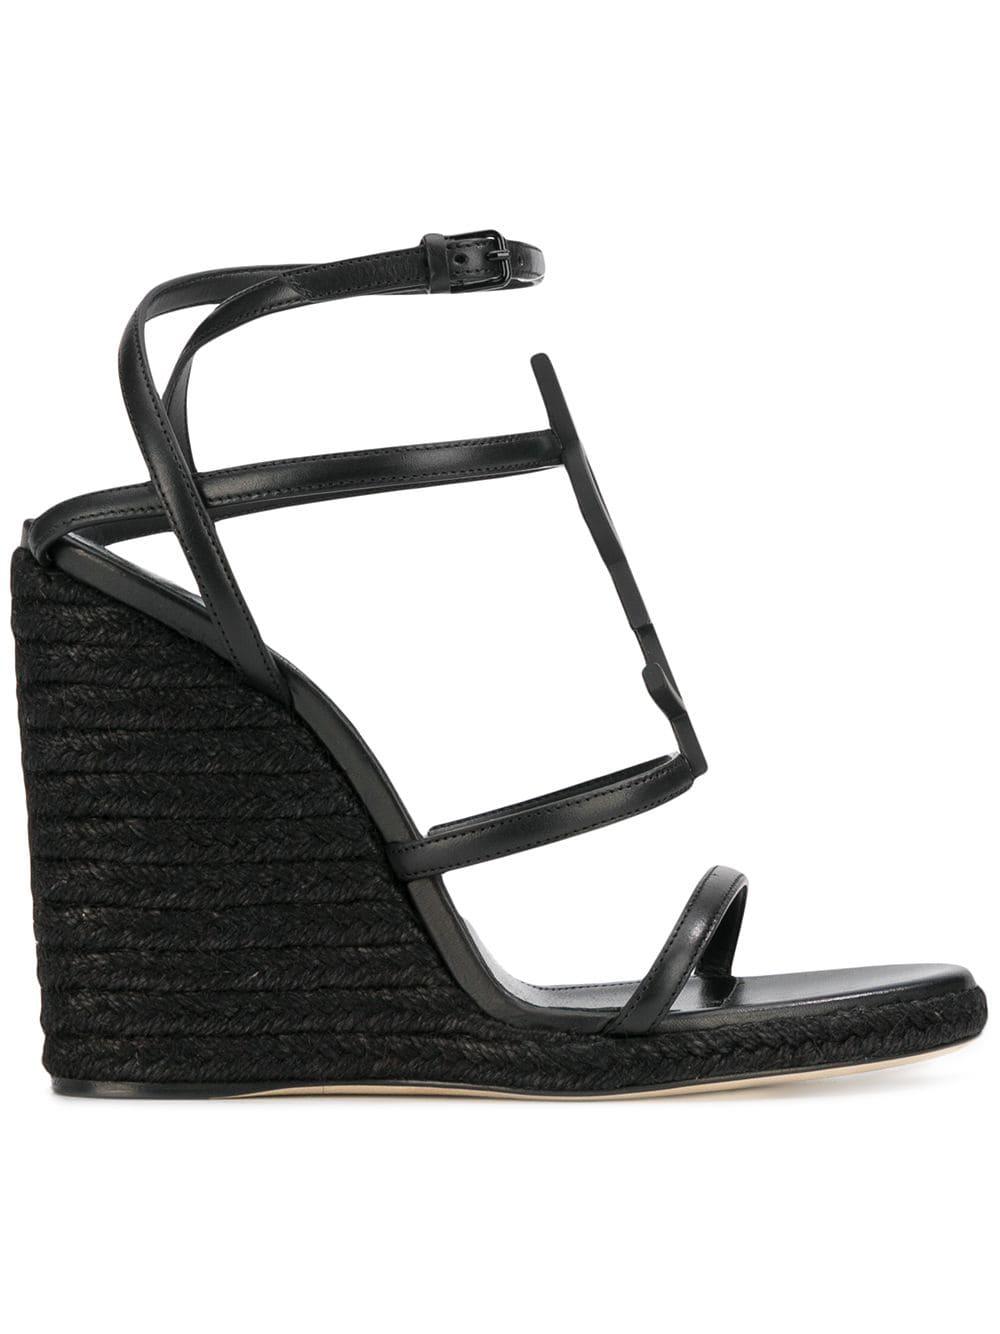 5d426014ff9 Saint Laurent Cassandra Wedge Espadrilles With Black Logo In Leather ...